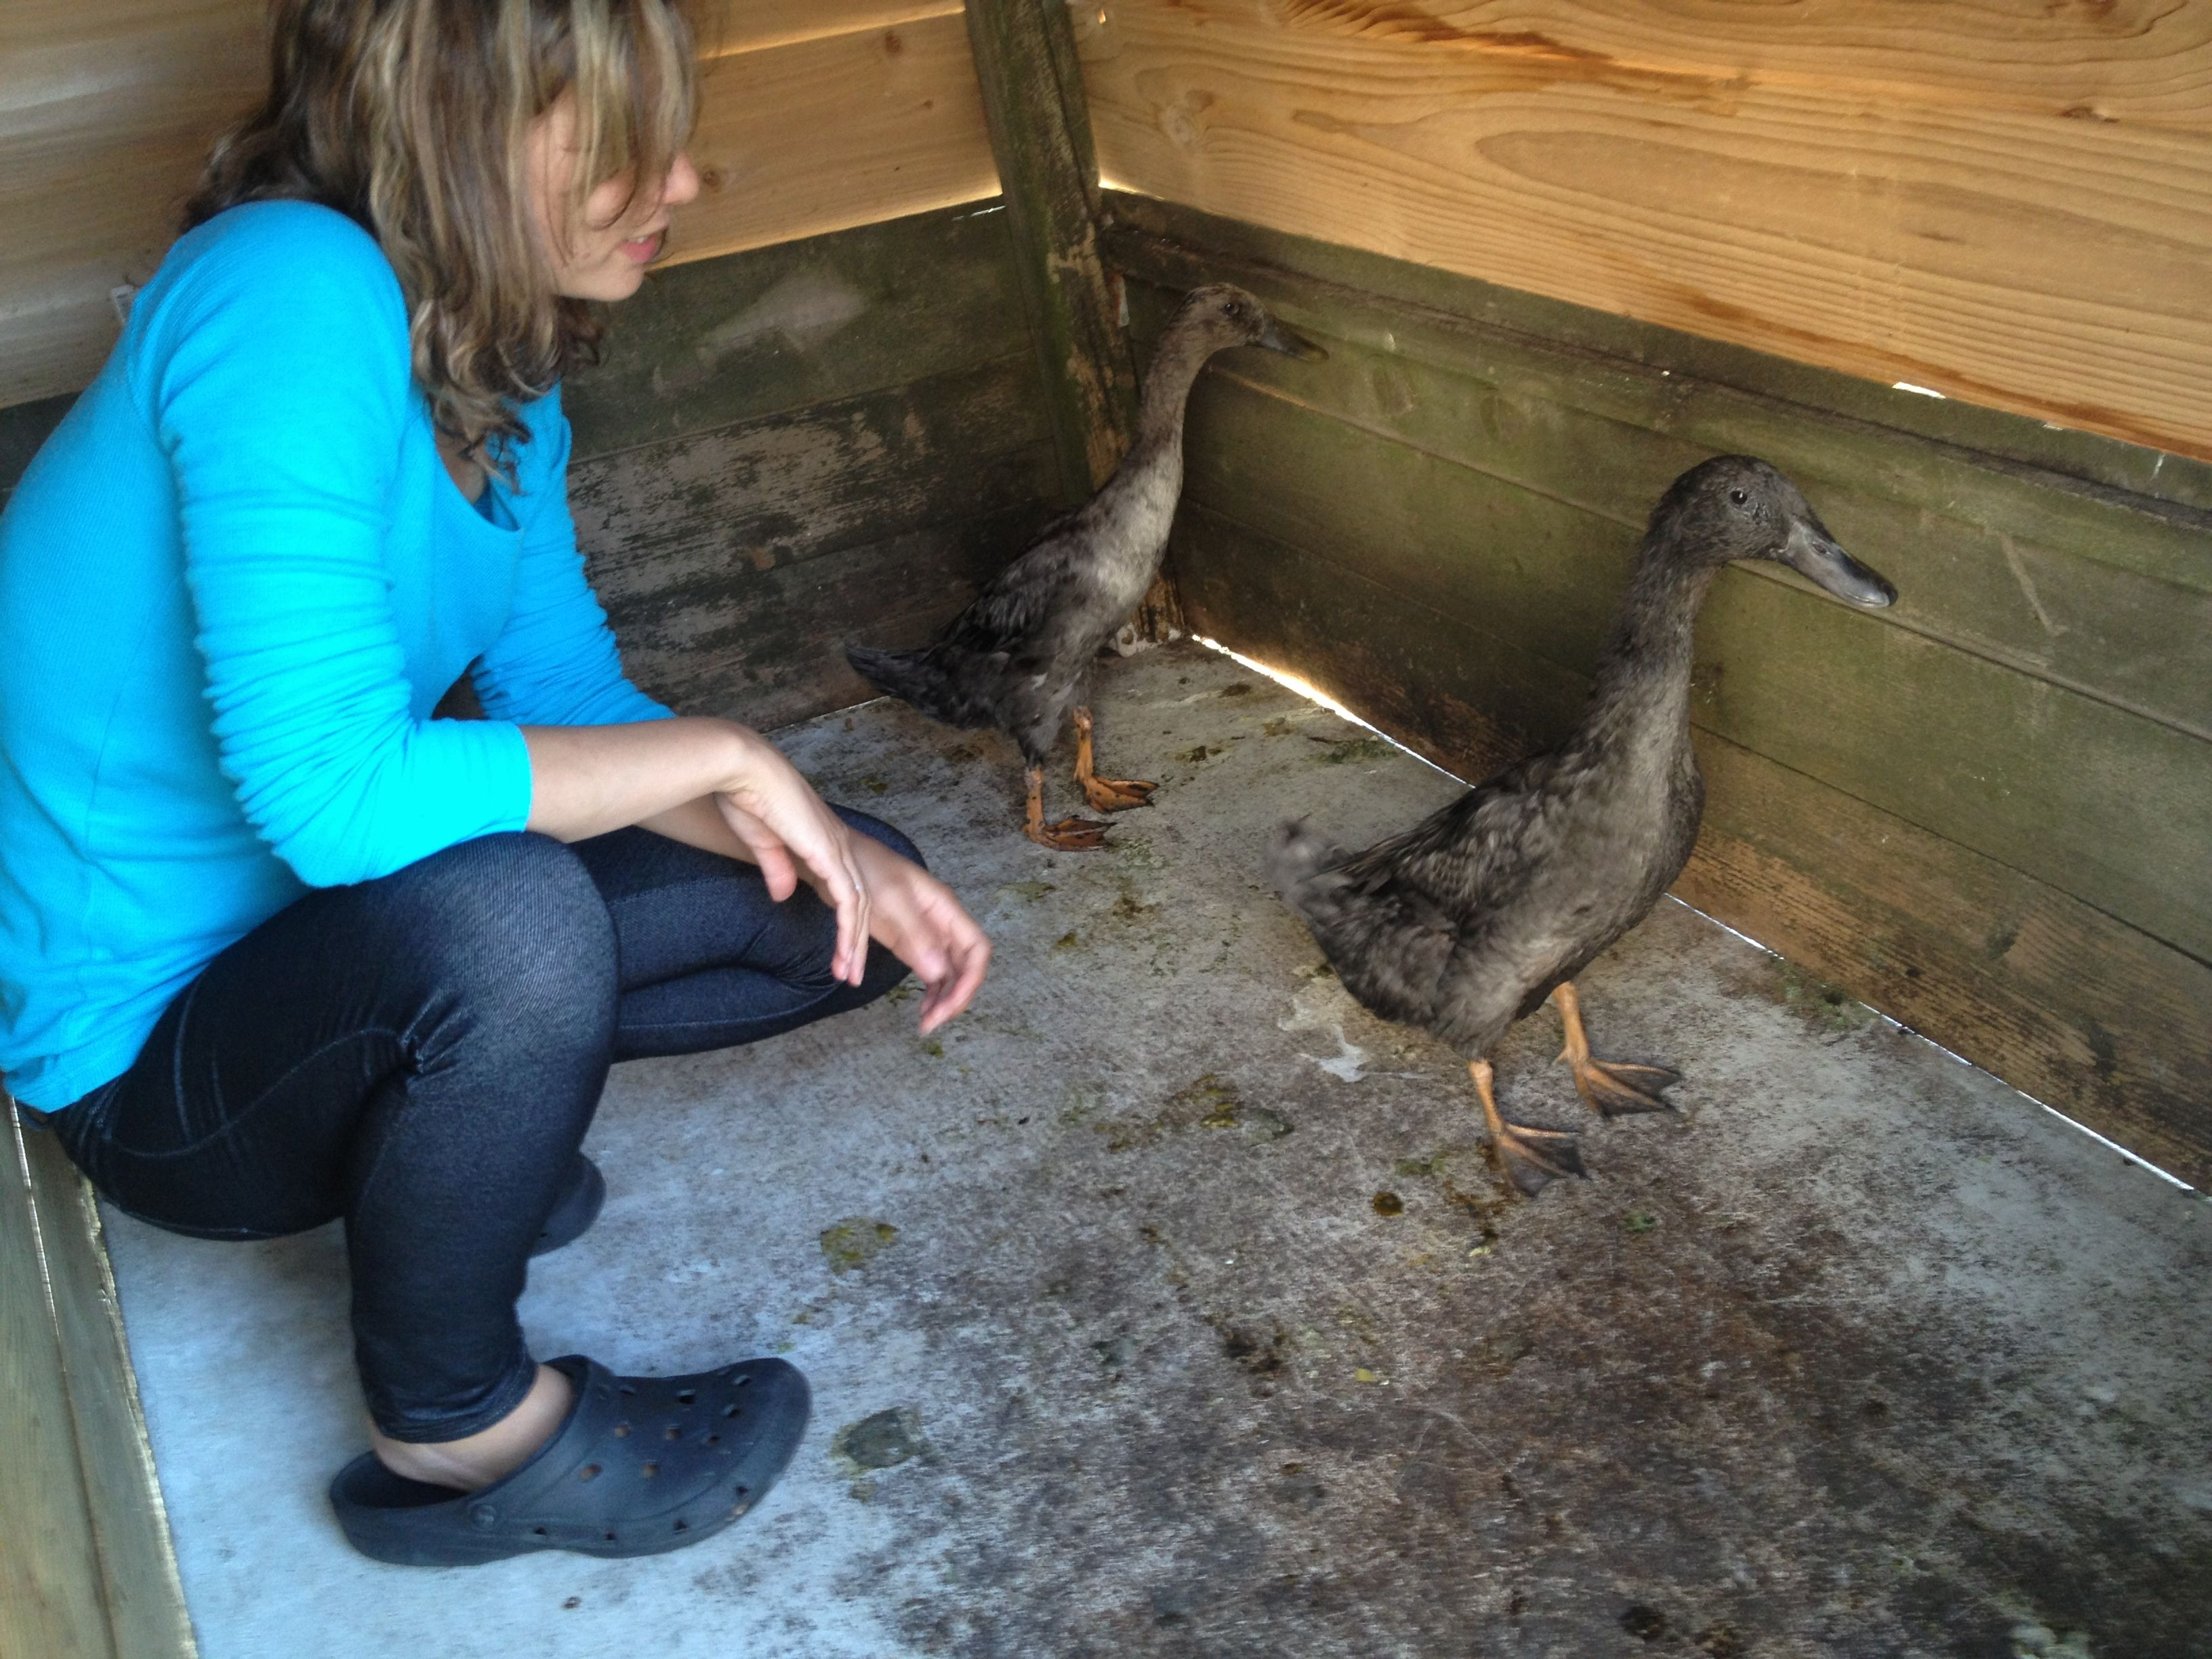 Building a duck house backyard ducks - Make a house a home ...